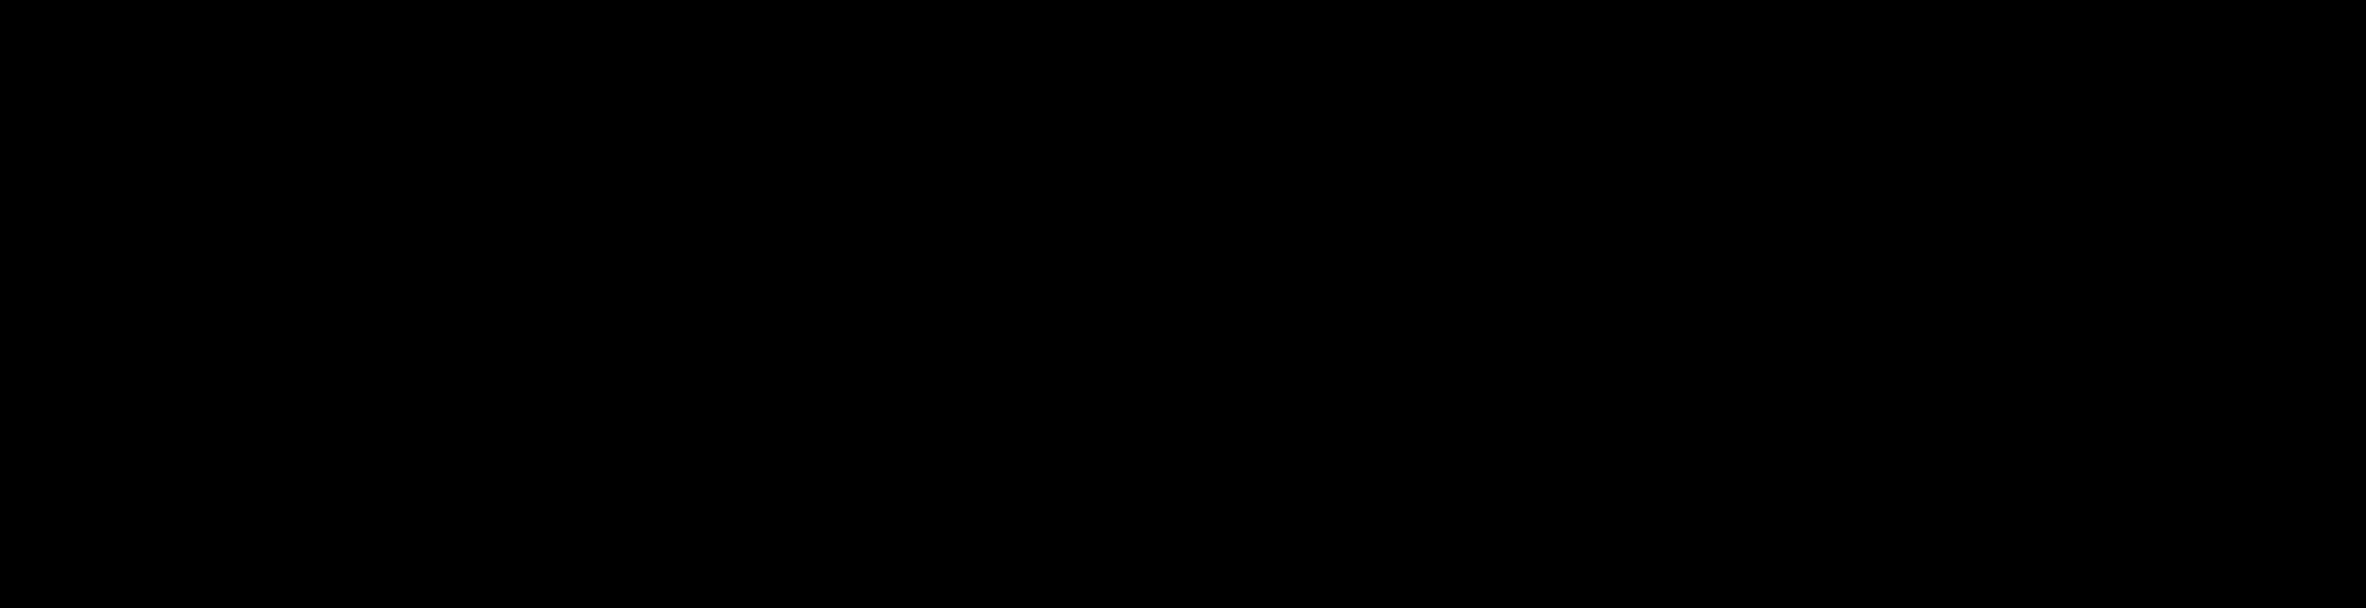 Sorafenib-<sup>13</sup>C, d<sub>3</sub>